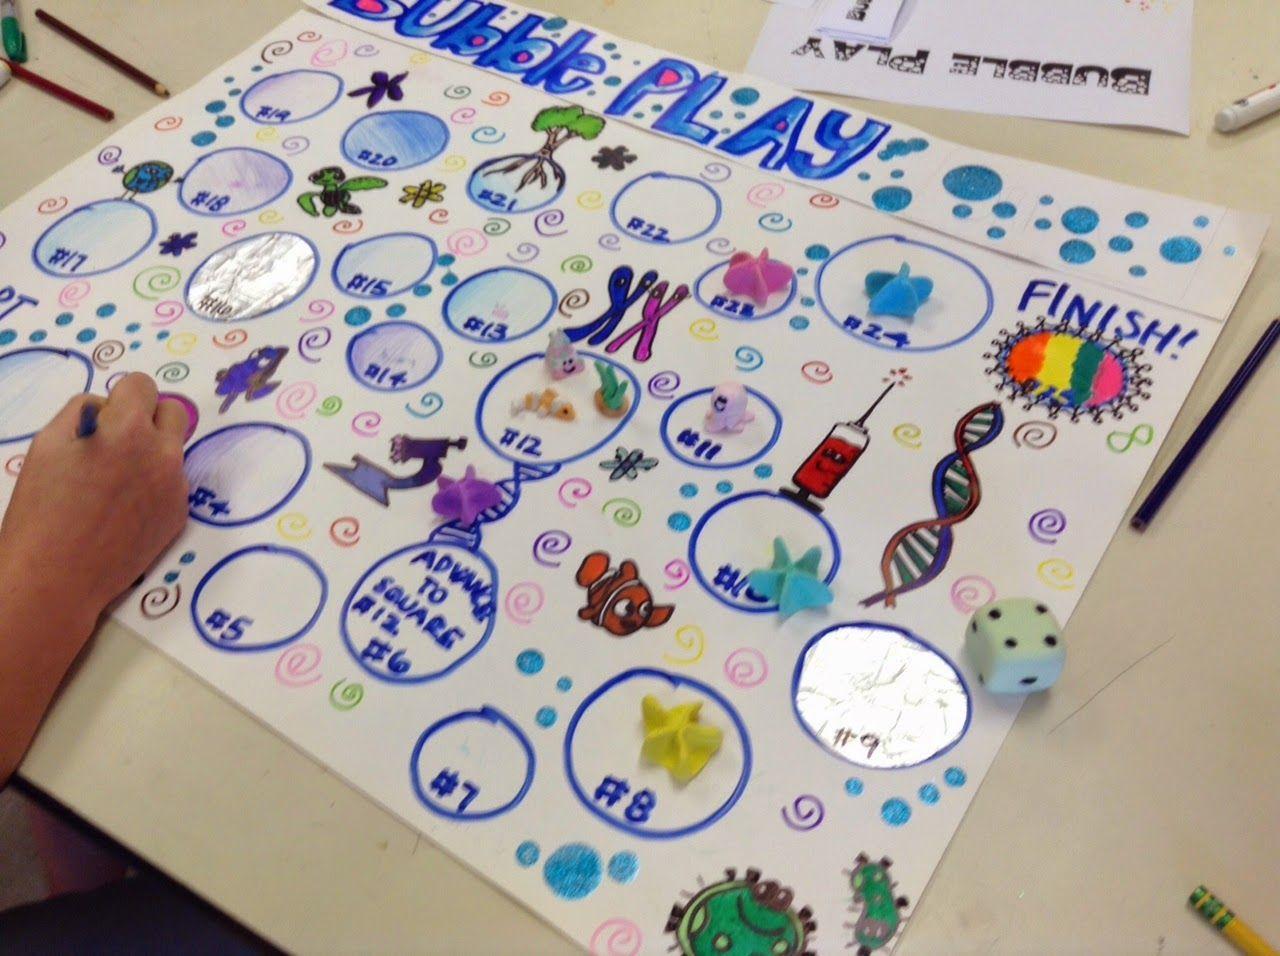 Art at Becker Middle School: Sci/Art Game Board Design